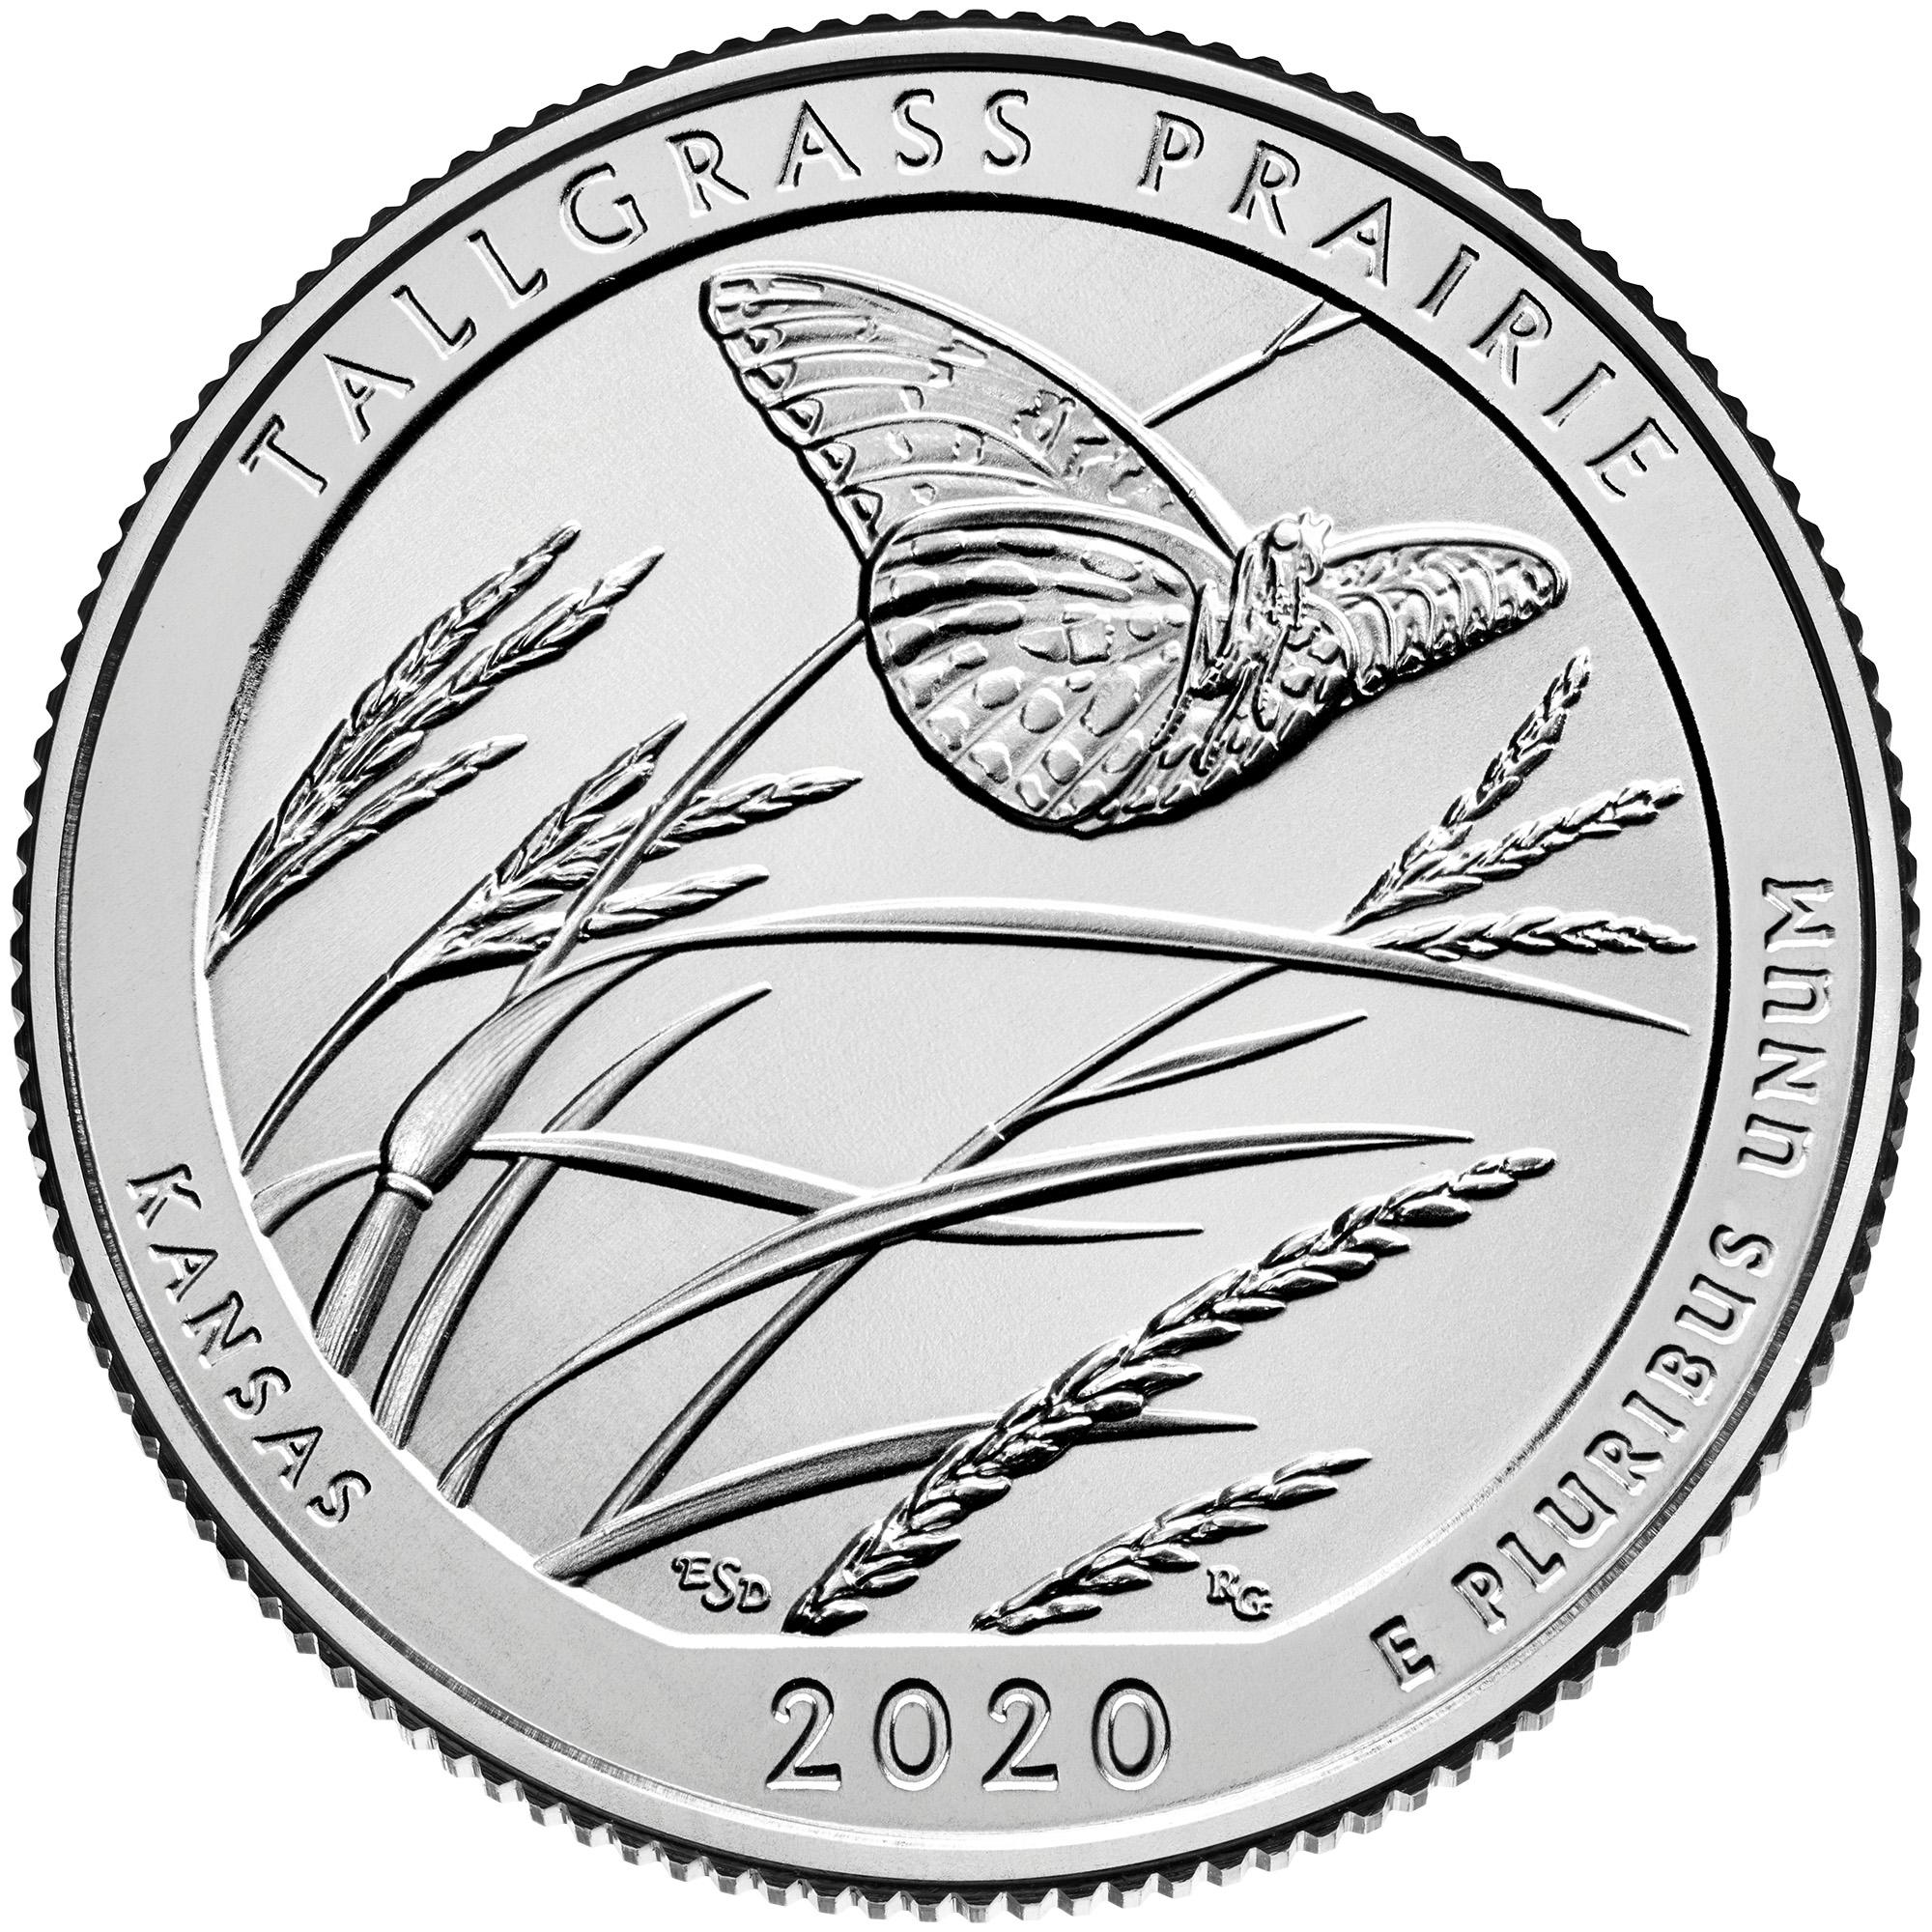 2020 America the Beautiful Quarters Coin Tallgrass Prairie Kansas Uncirculated Reverse